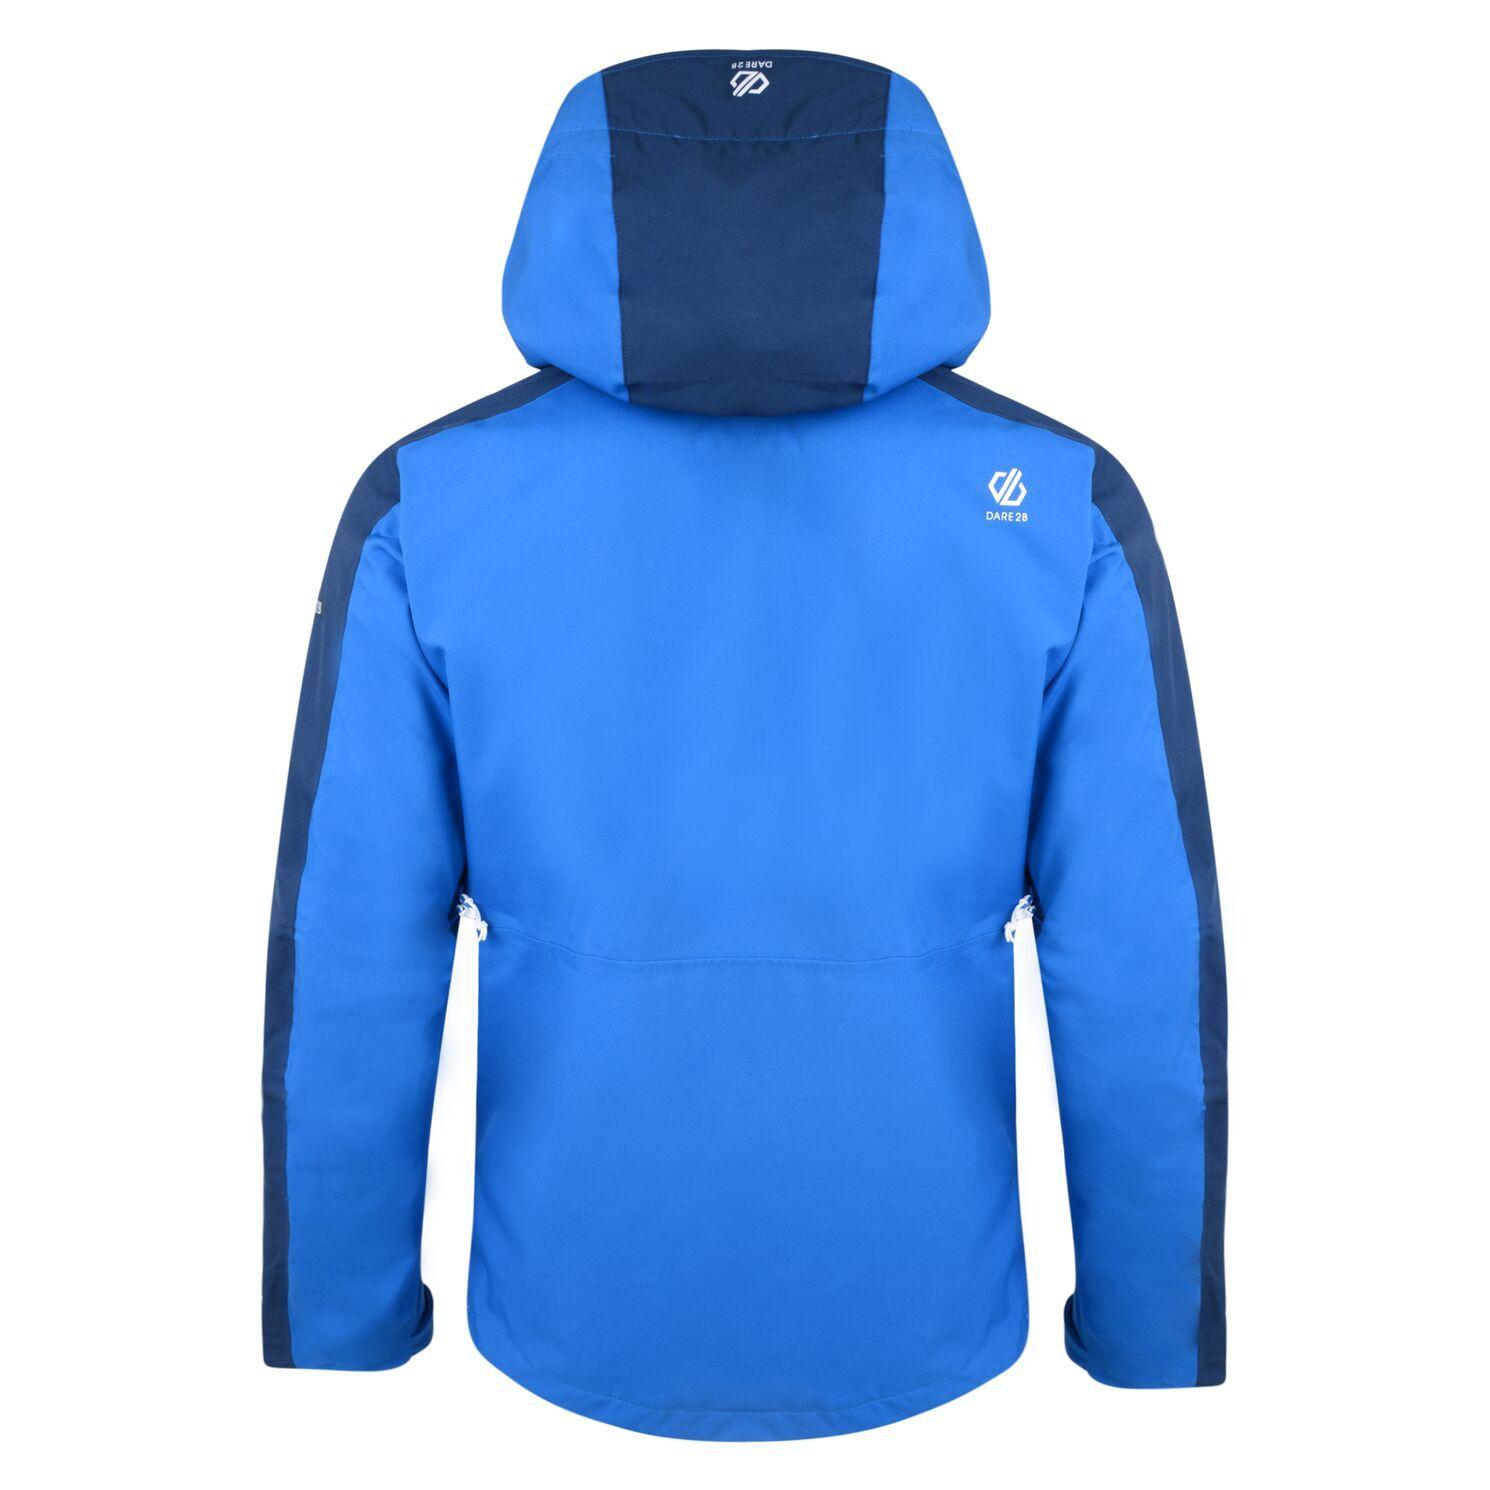 Dare 2B Mens Diluent Lightweight Waterproof Jacket With Detachable Hood